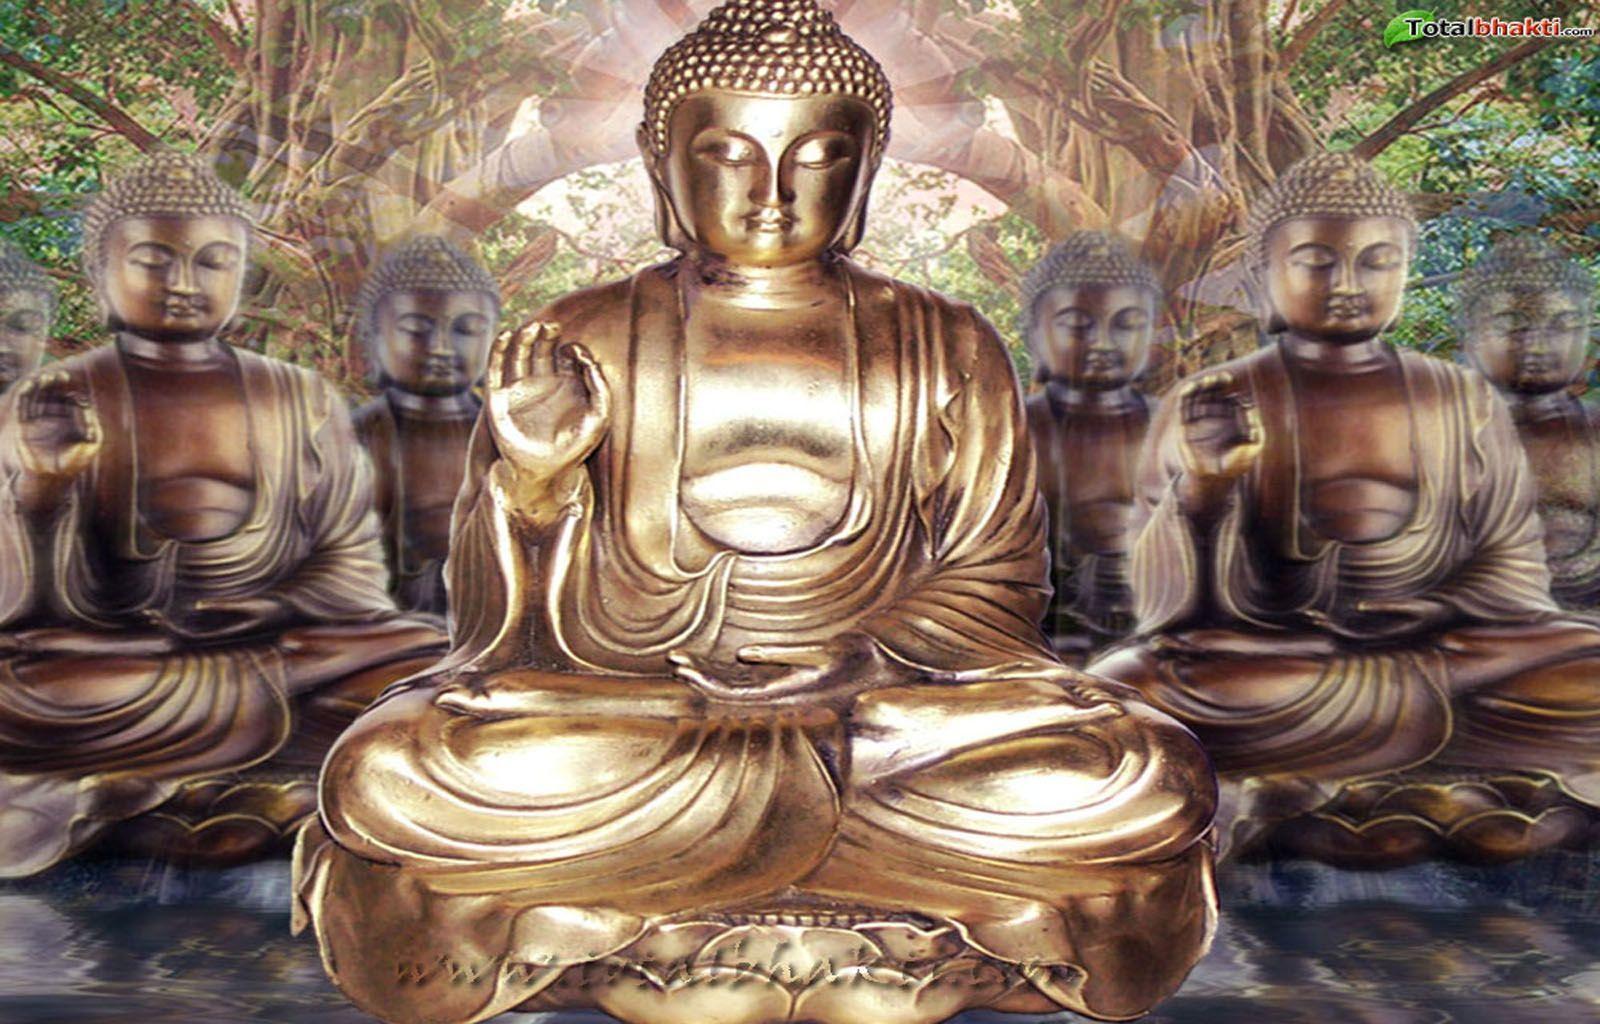 buddha wallpaper, Hindu wallpaper, Lord Buddha blessing images ...